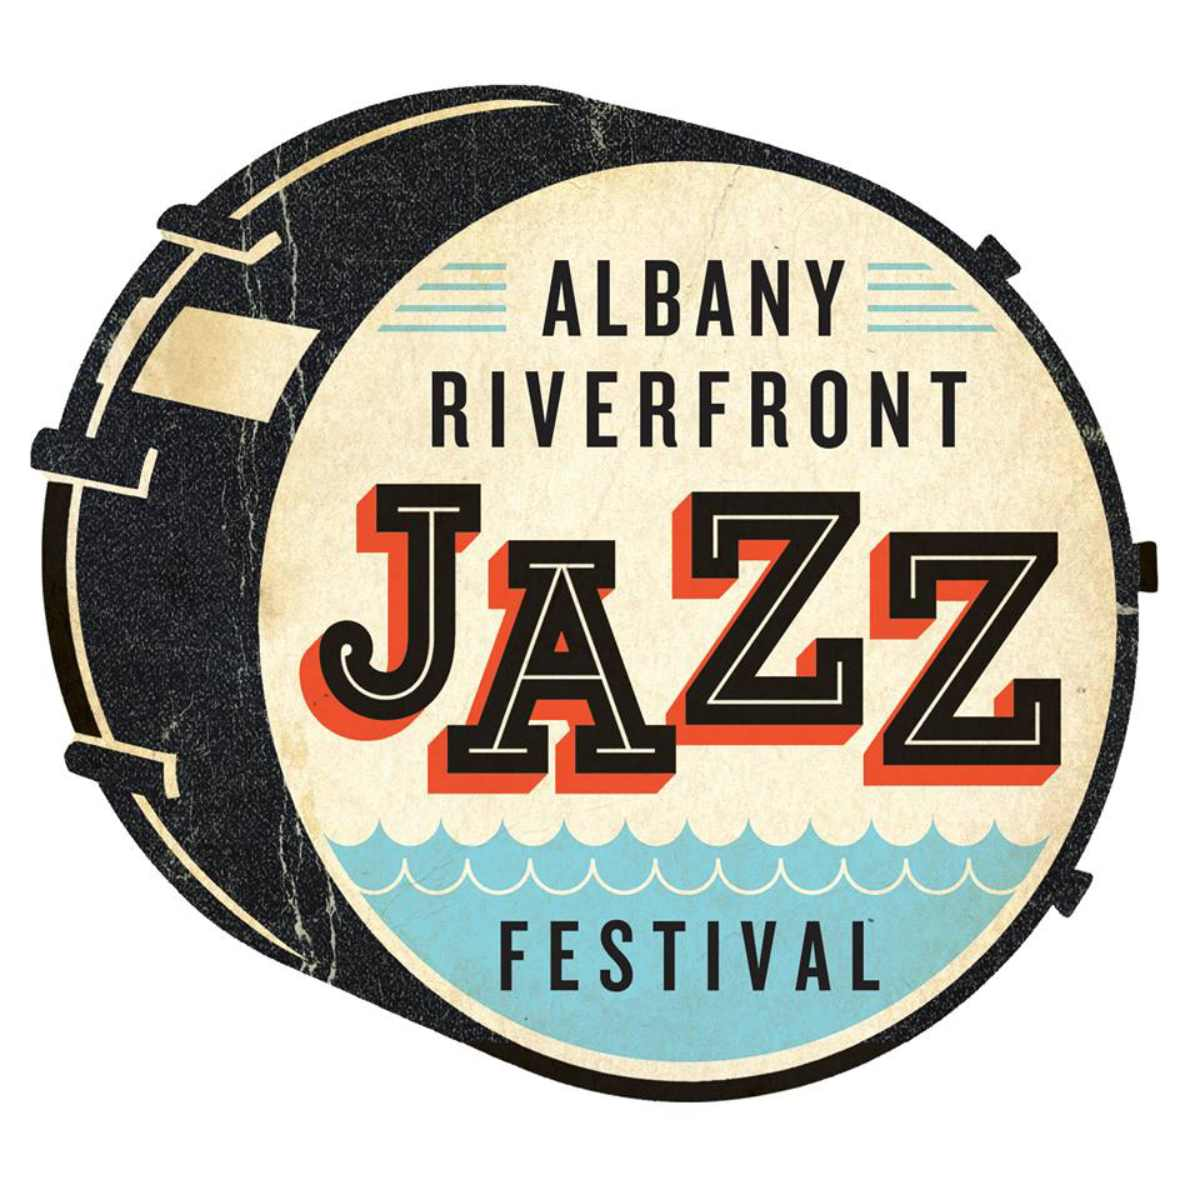 logo for albany riverfront jazz festival